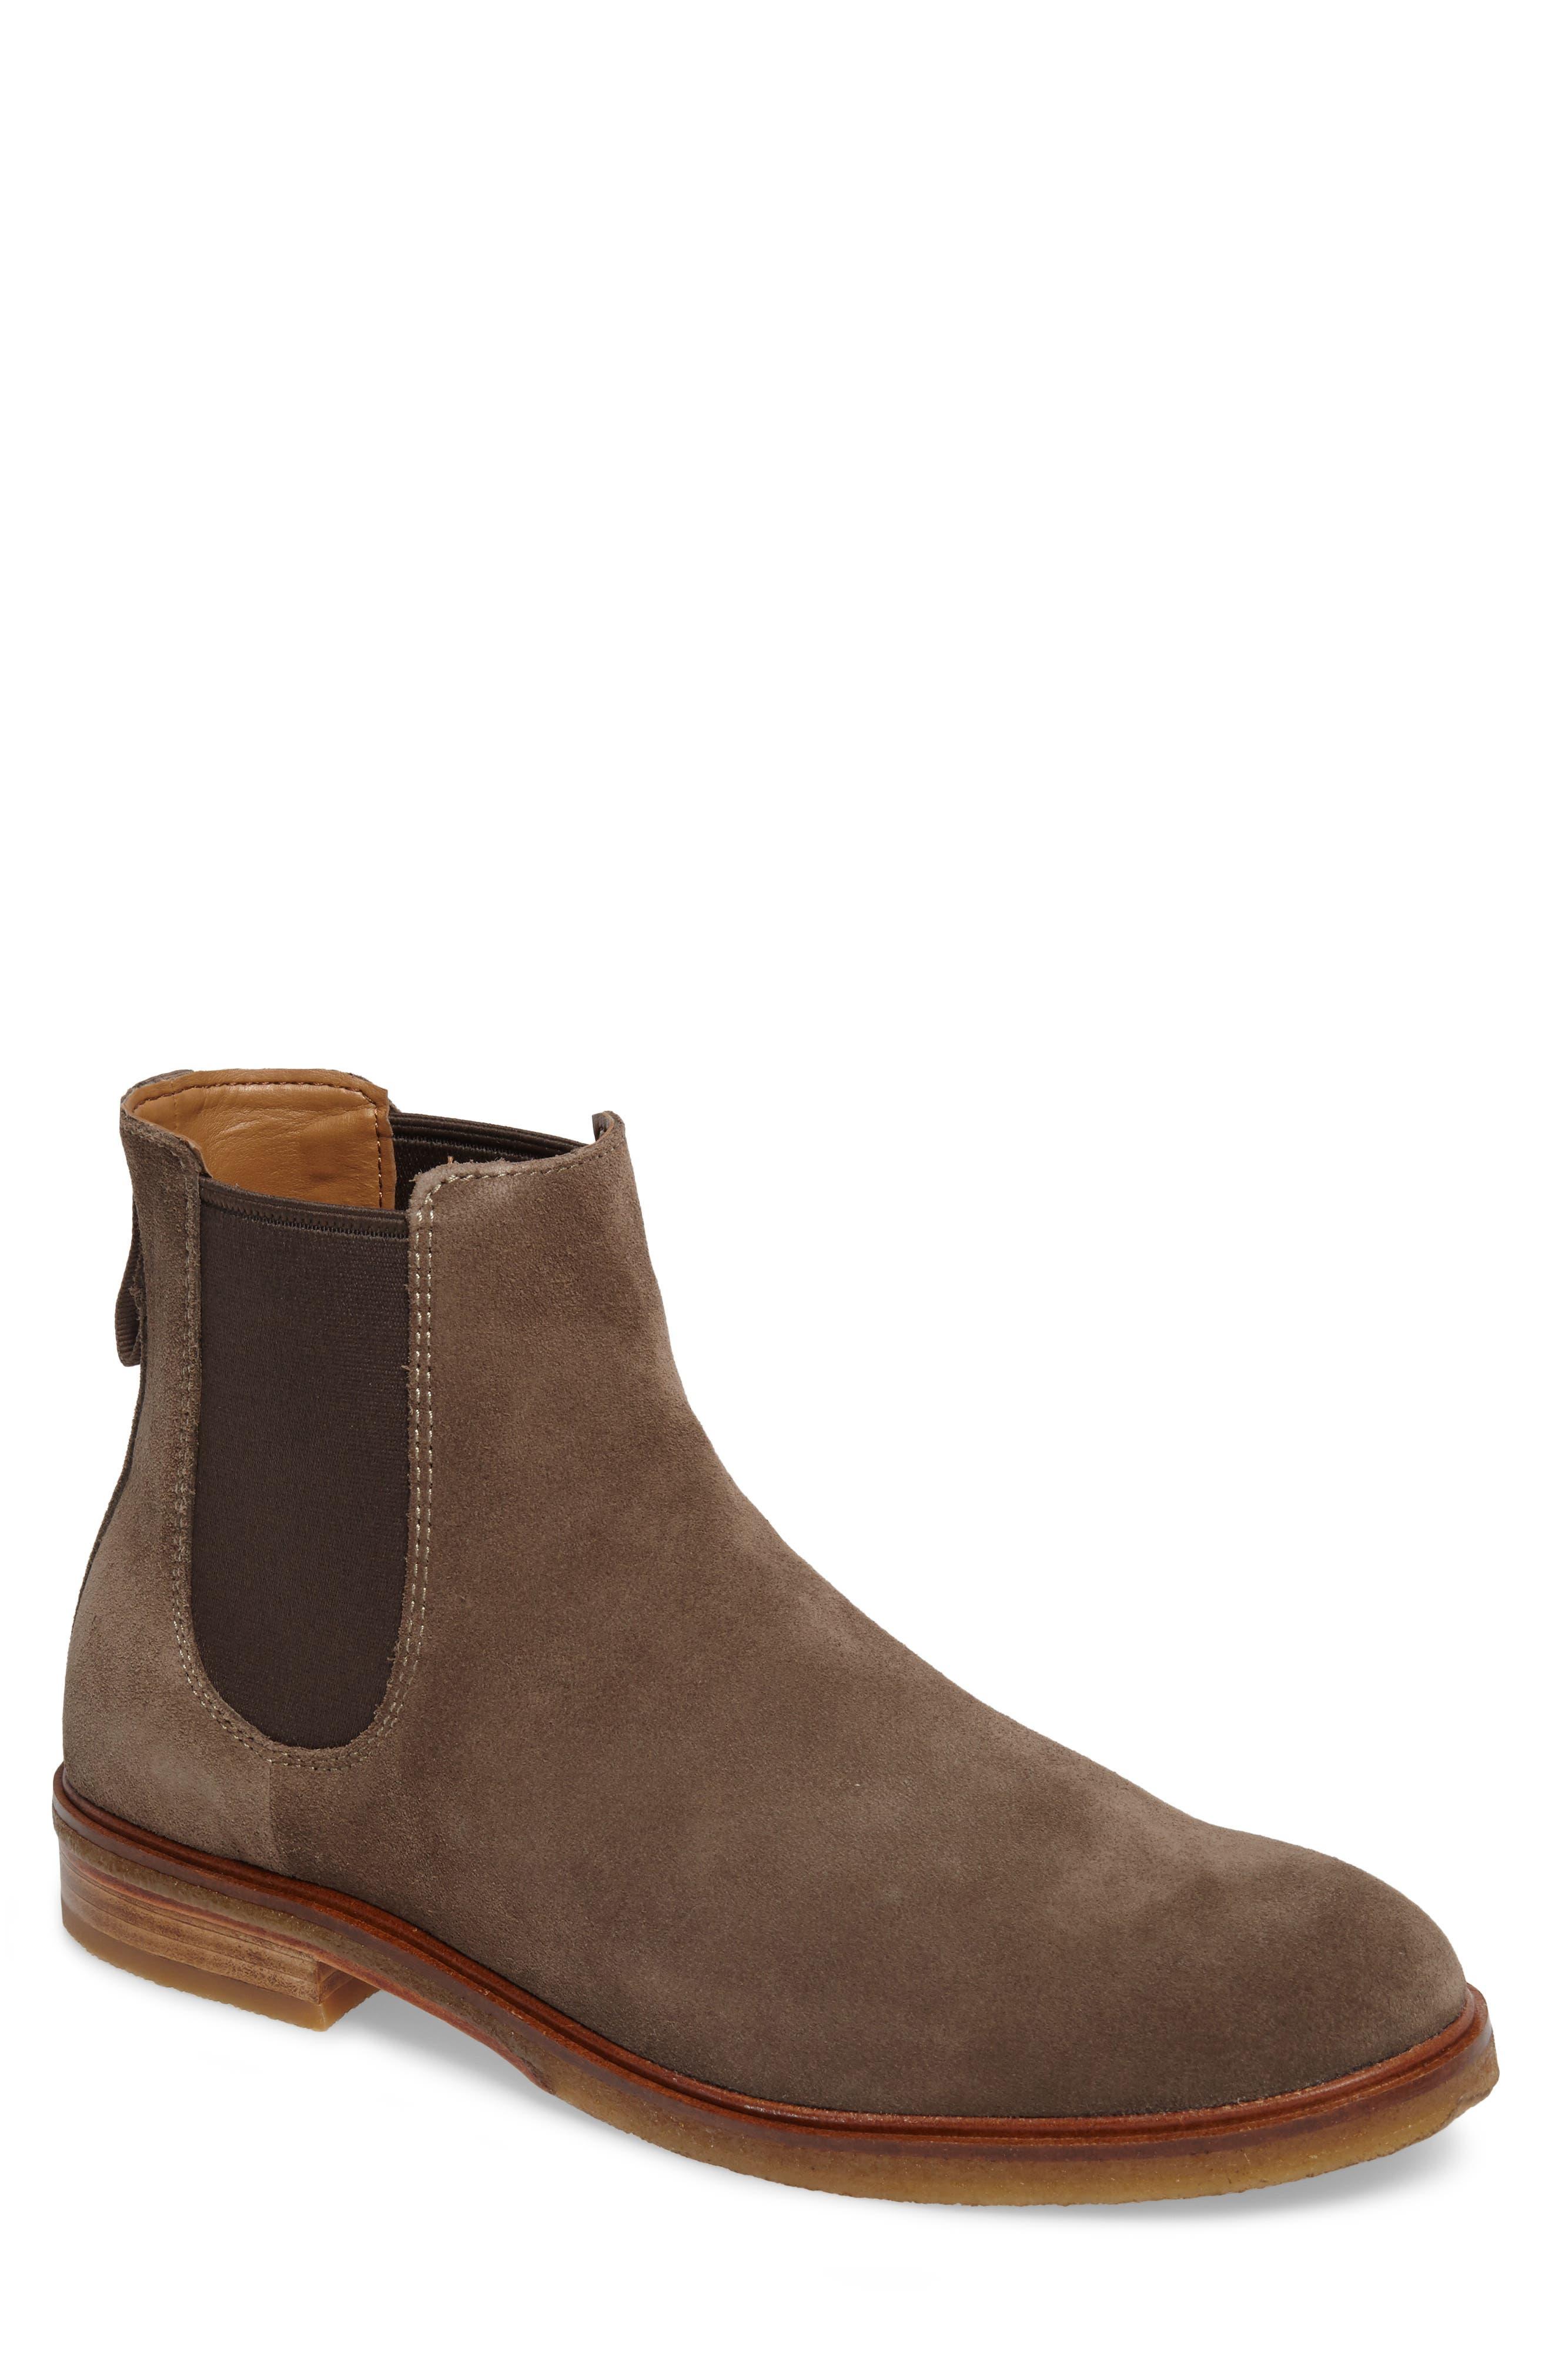 Alternate Image 1 Selected - Clarks® Clarkdale Chelsea Boot (Men)